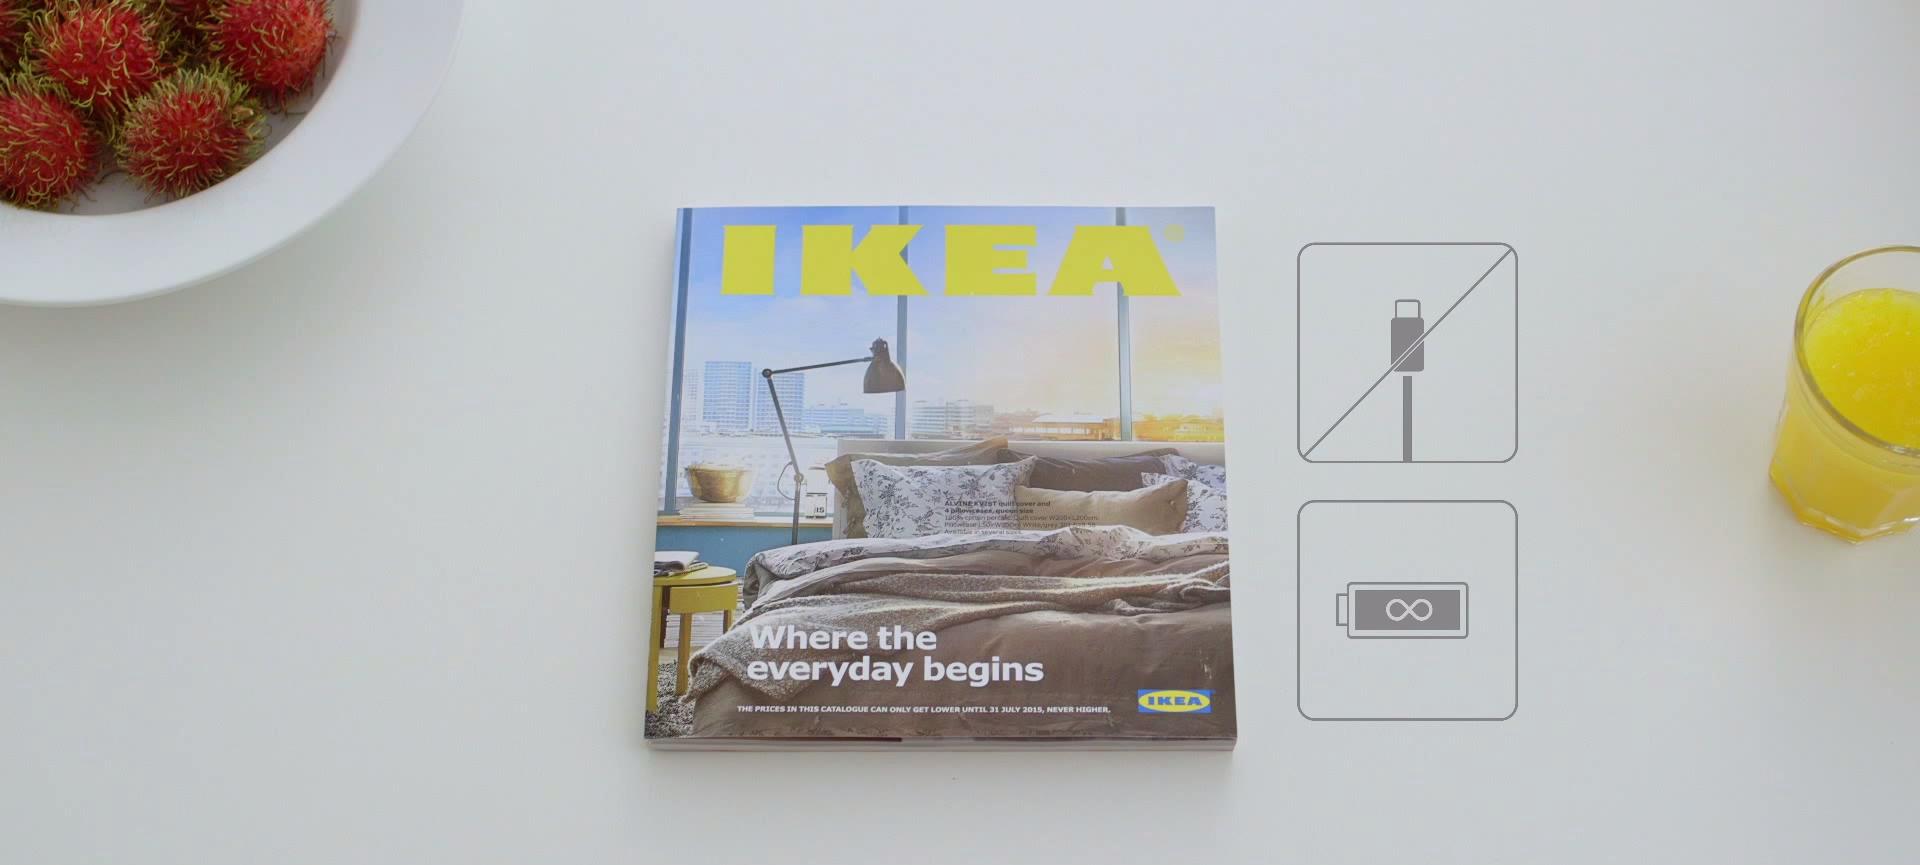 Ikea d voile le bookbook en parodiant apple weblife - Ikea le plus proche ...